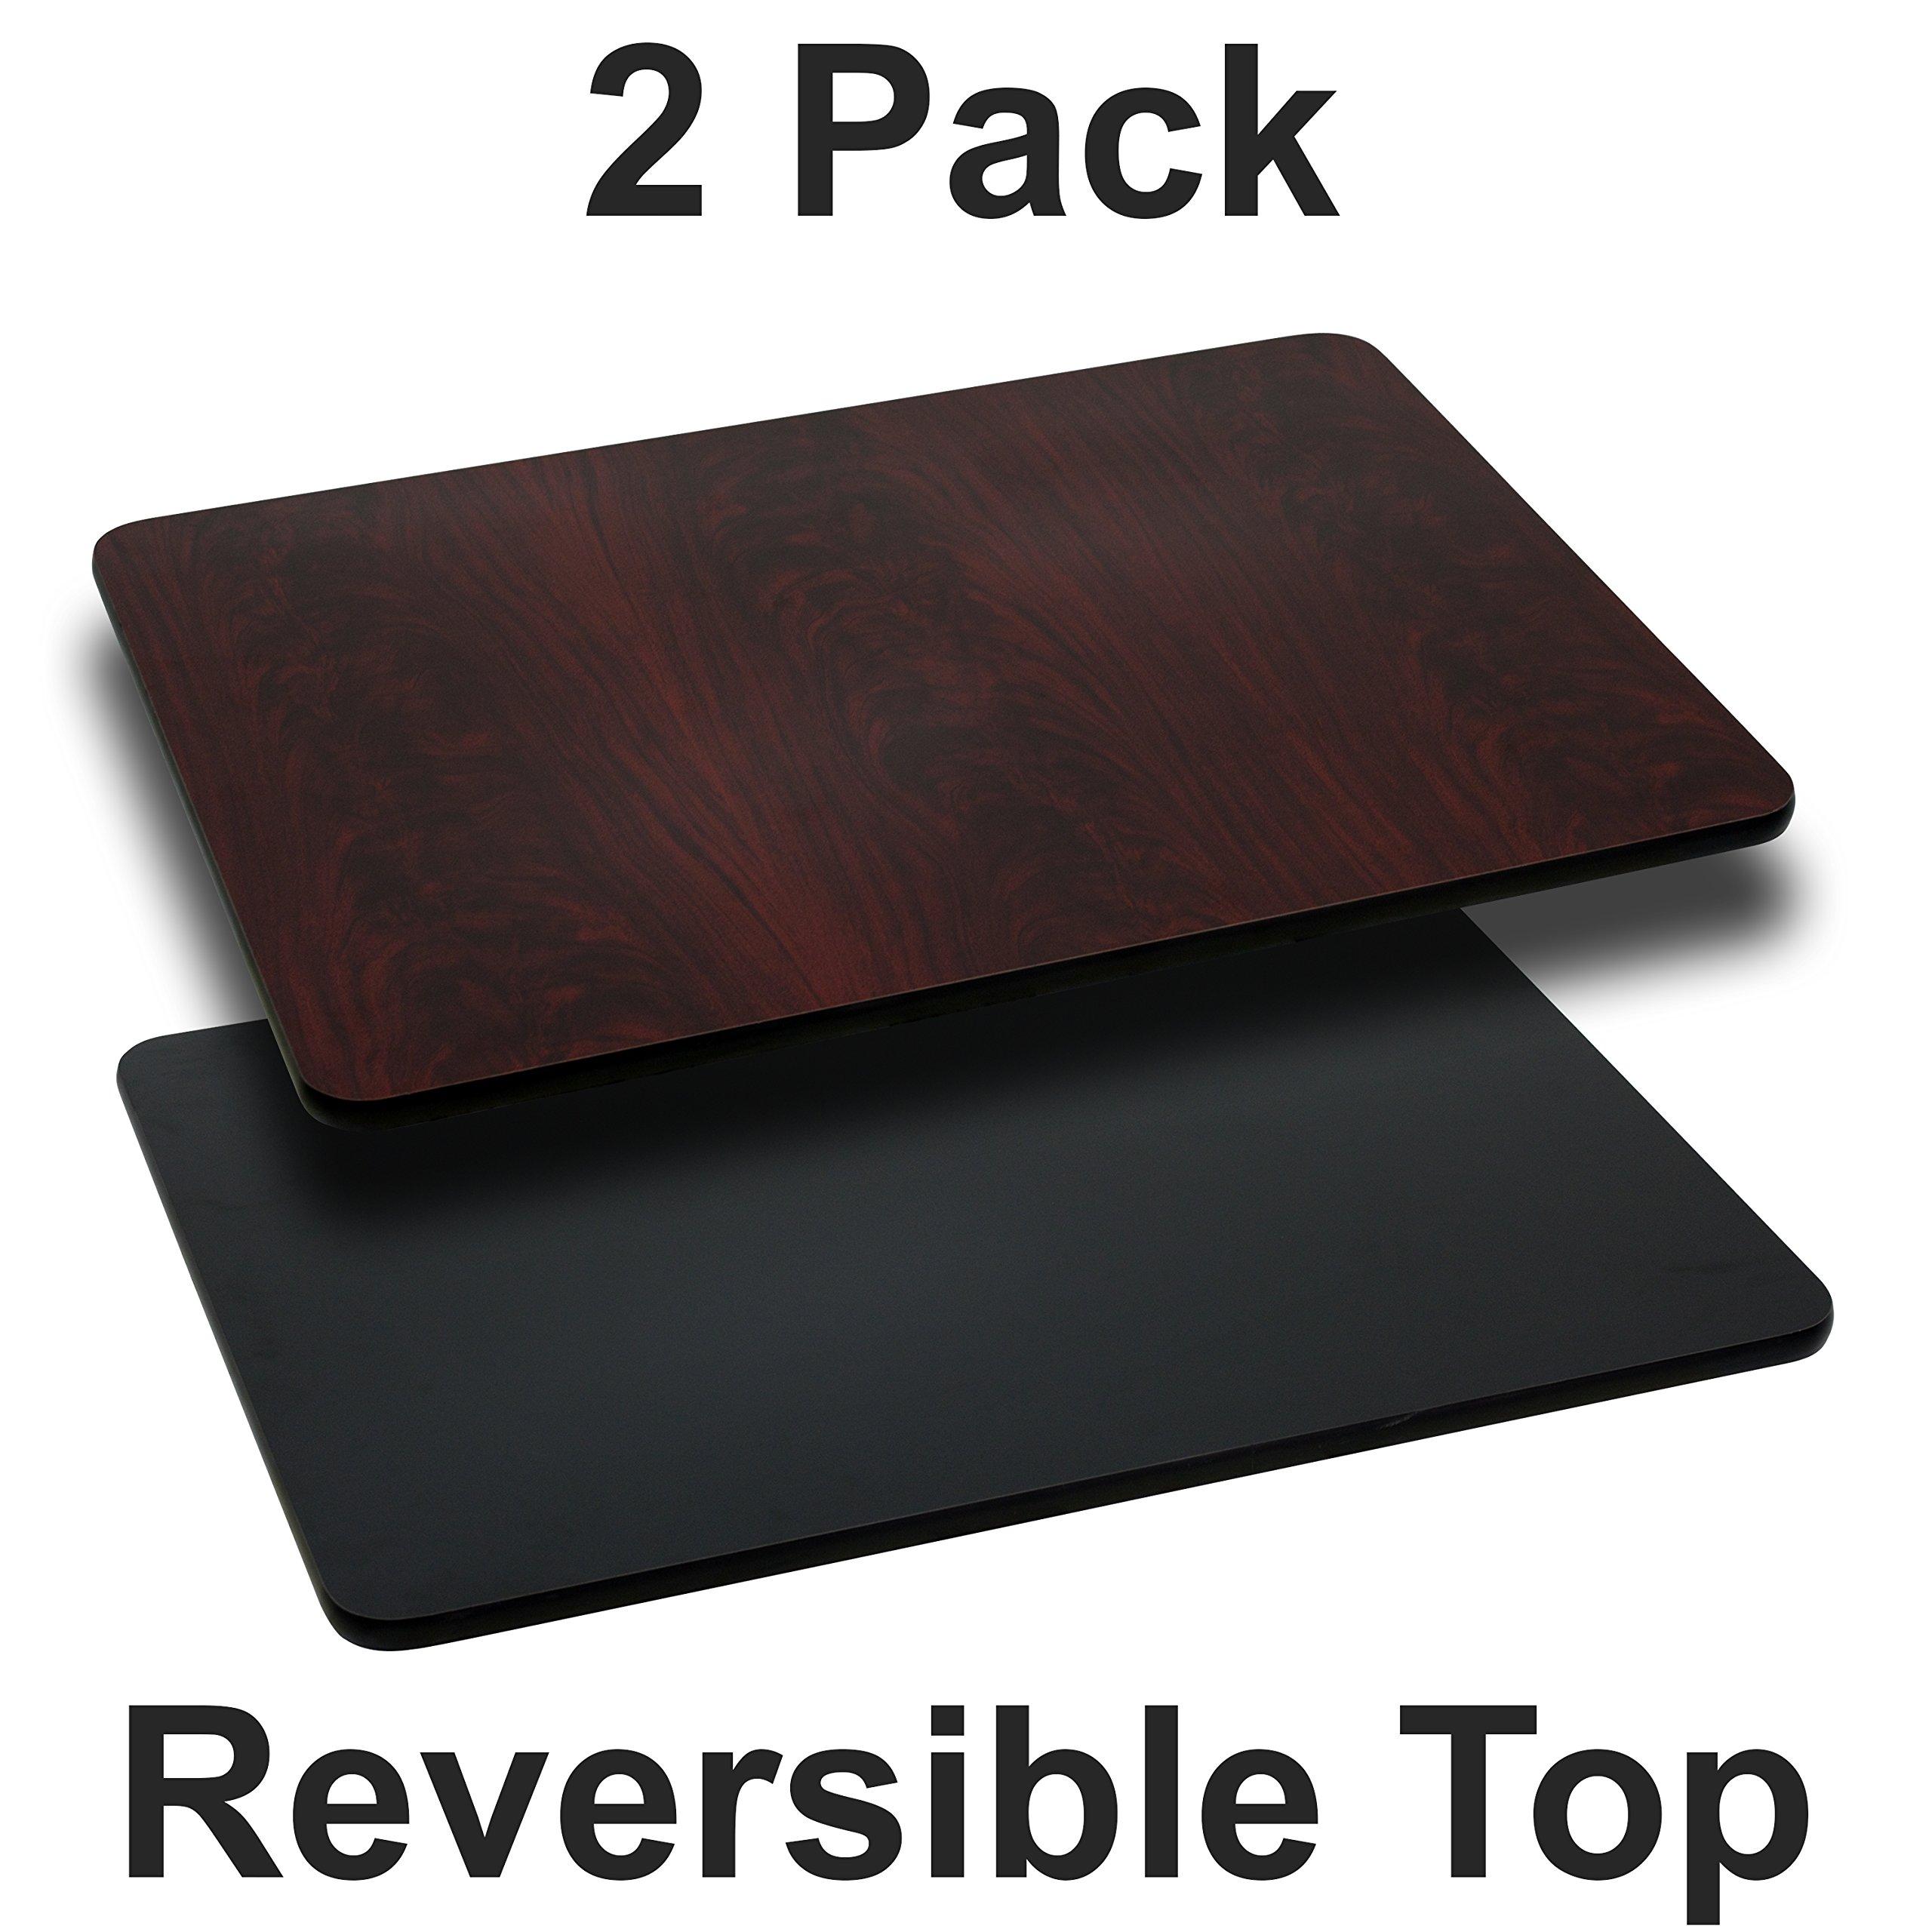 Flash Furniture 2-XU-MBT-3042-GG 30x42 BK/MA Reversible Laminate Tops, 2 Pack, Black/Mahogany